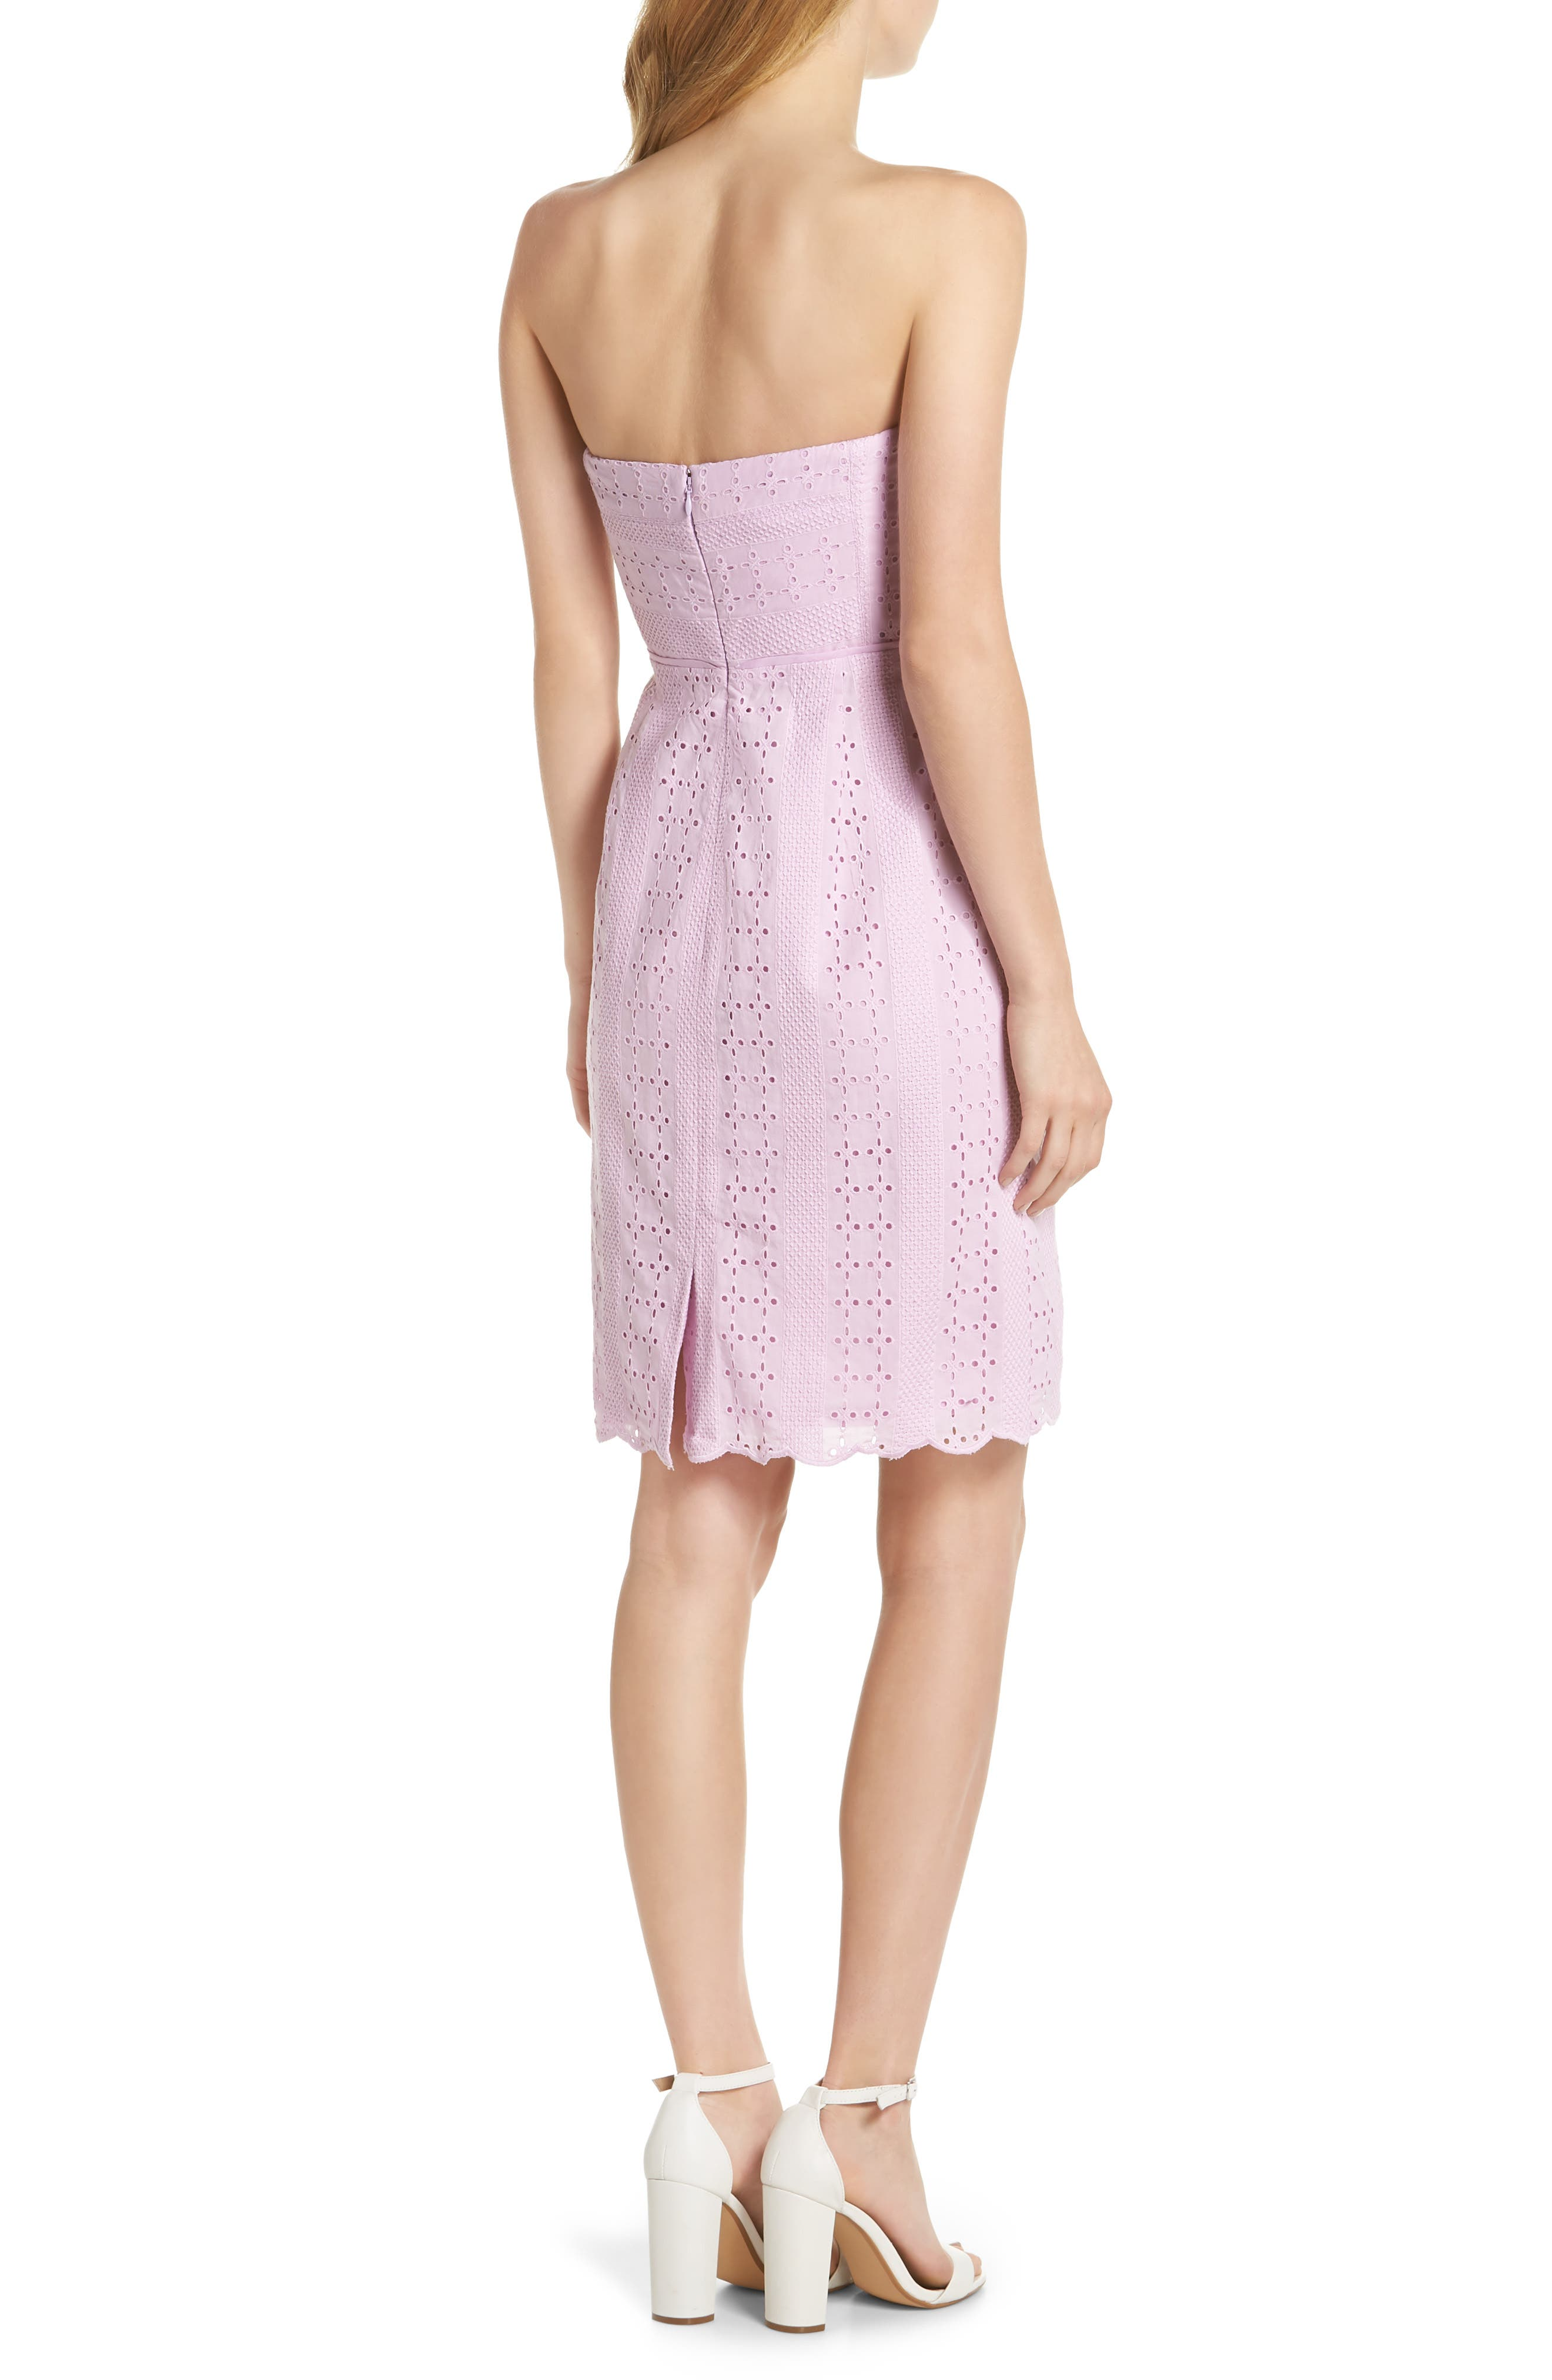 J.Crew Strapless Eyelet Sheath Dress,                             Alternate thumbnail 2, color,                             Lavender Mist